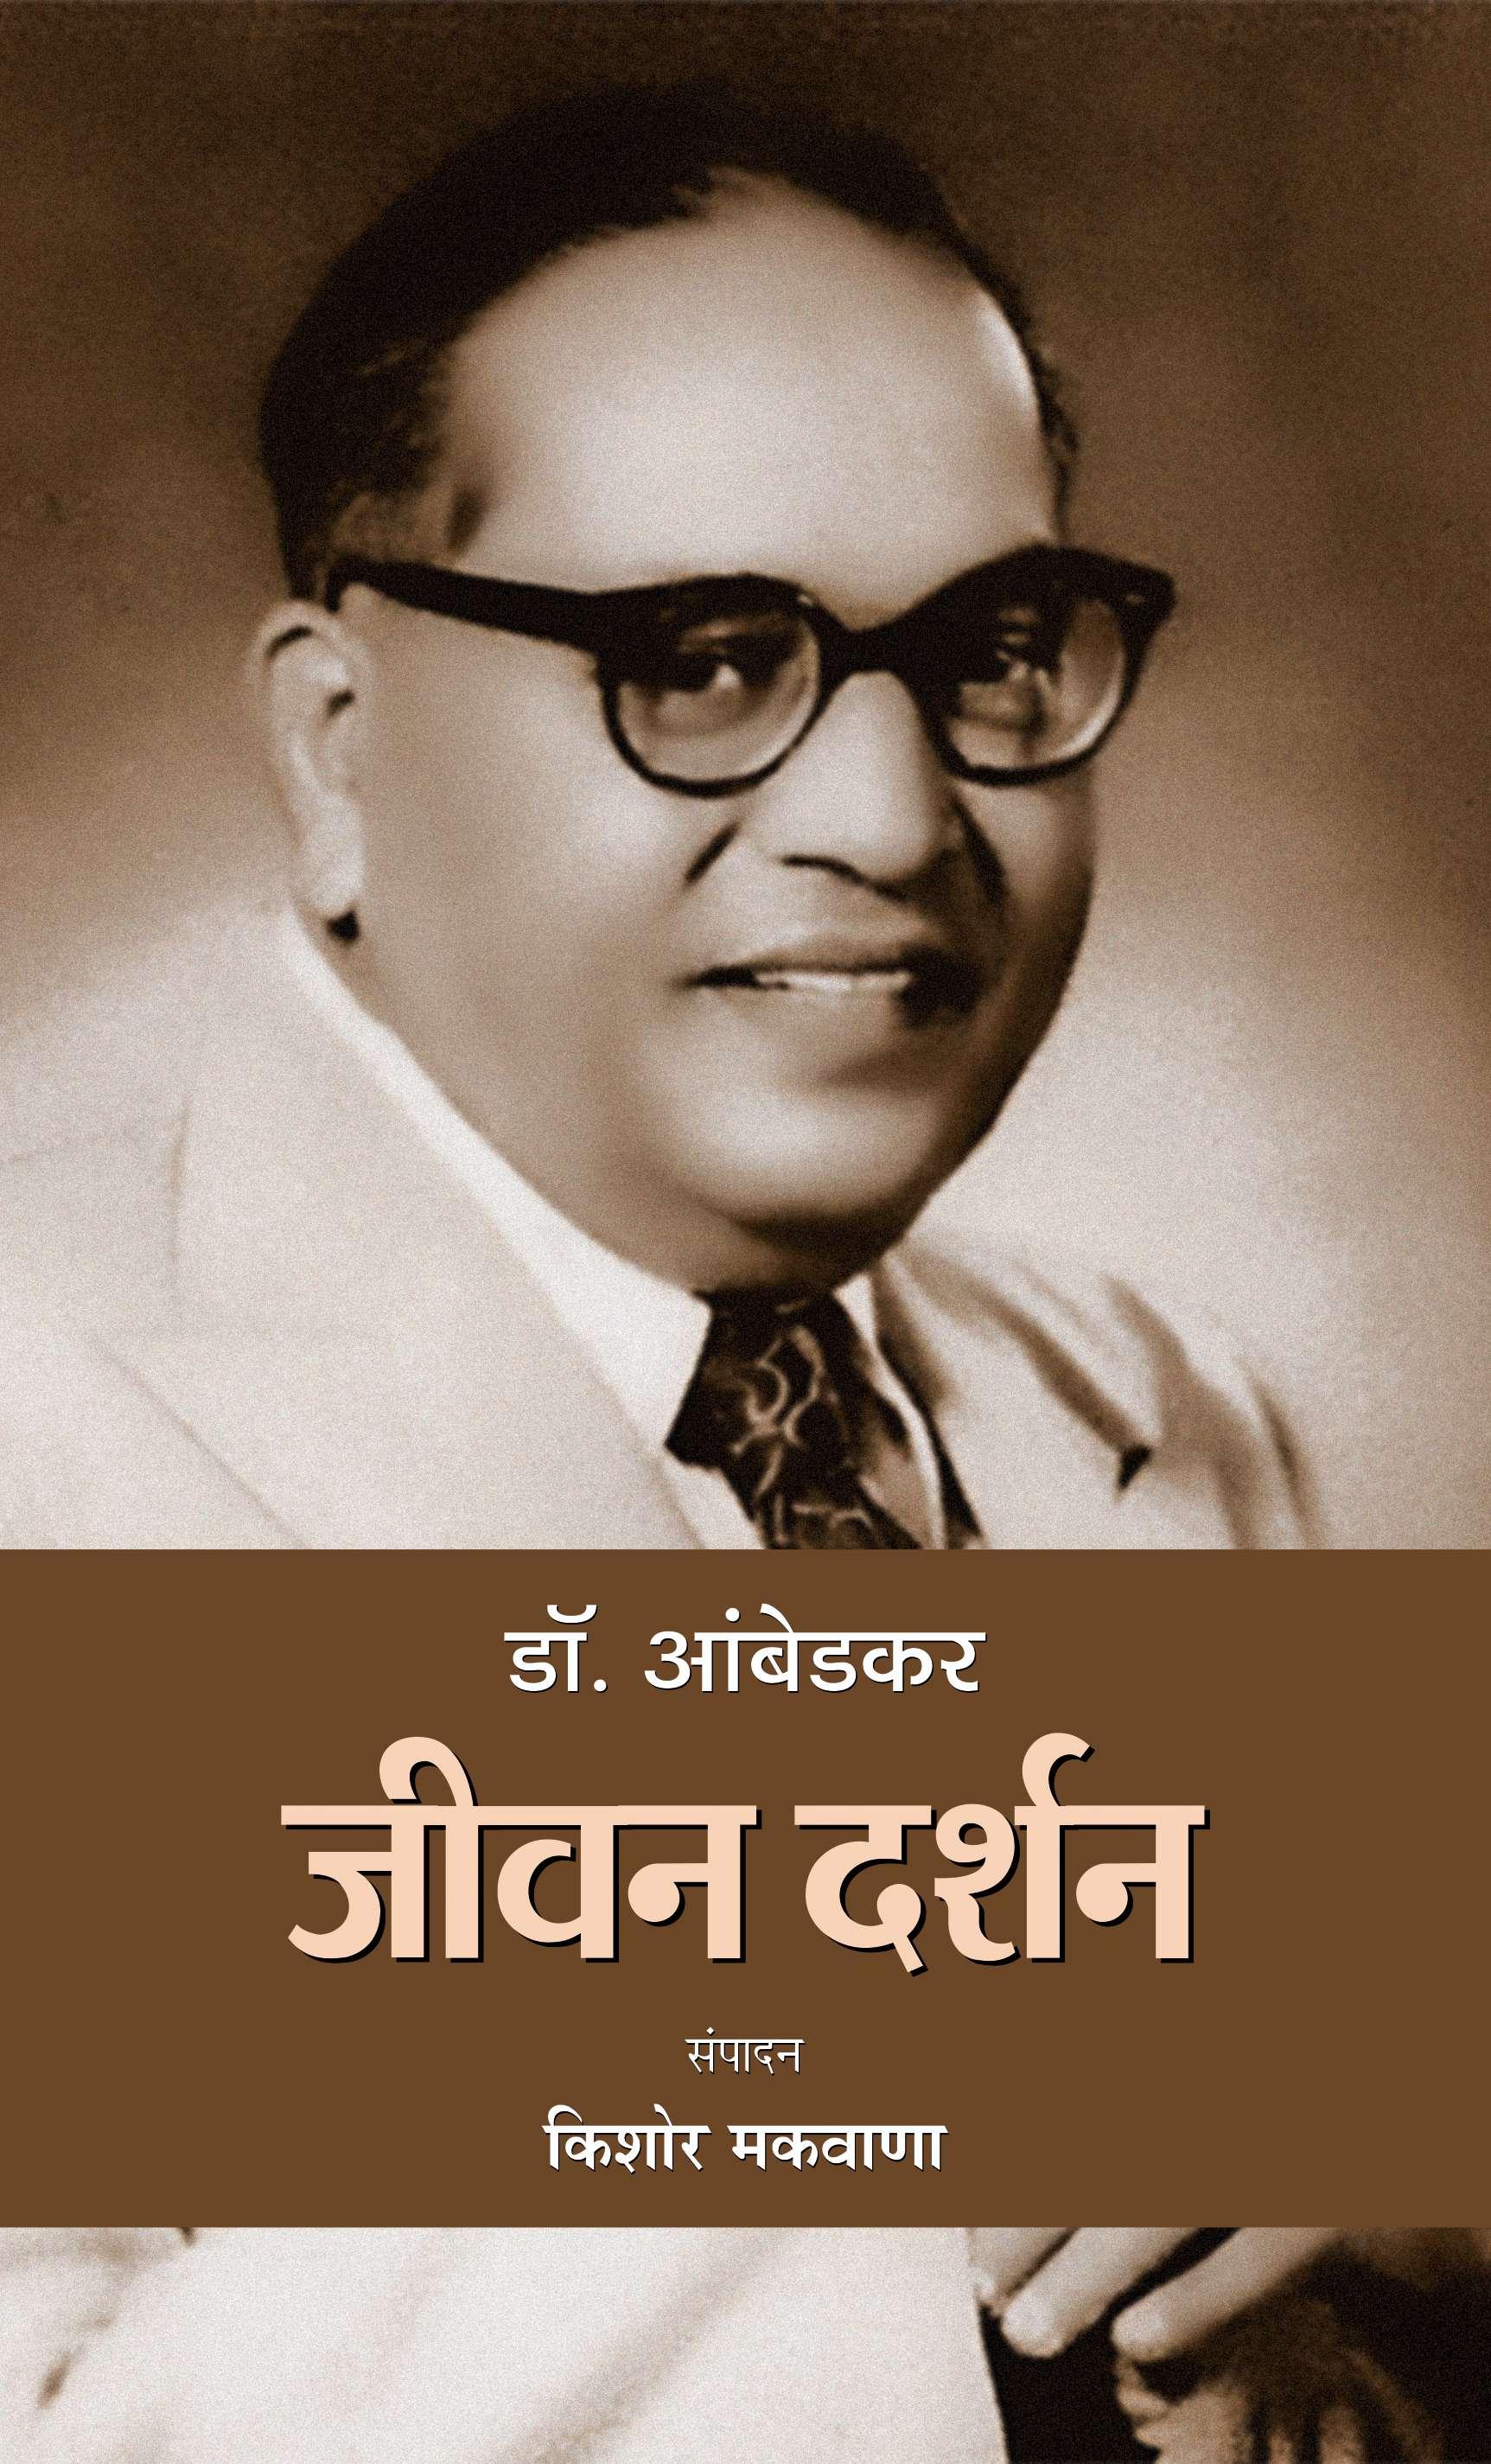 Dr. Ambedkar : Jeevan Darshan